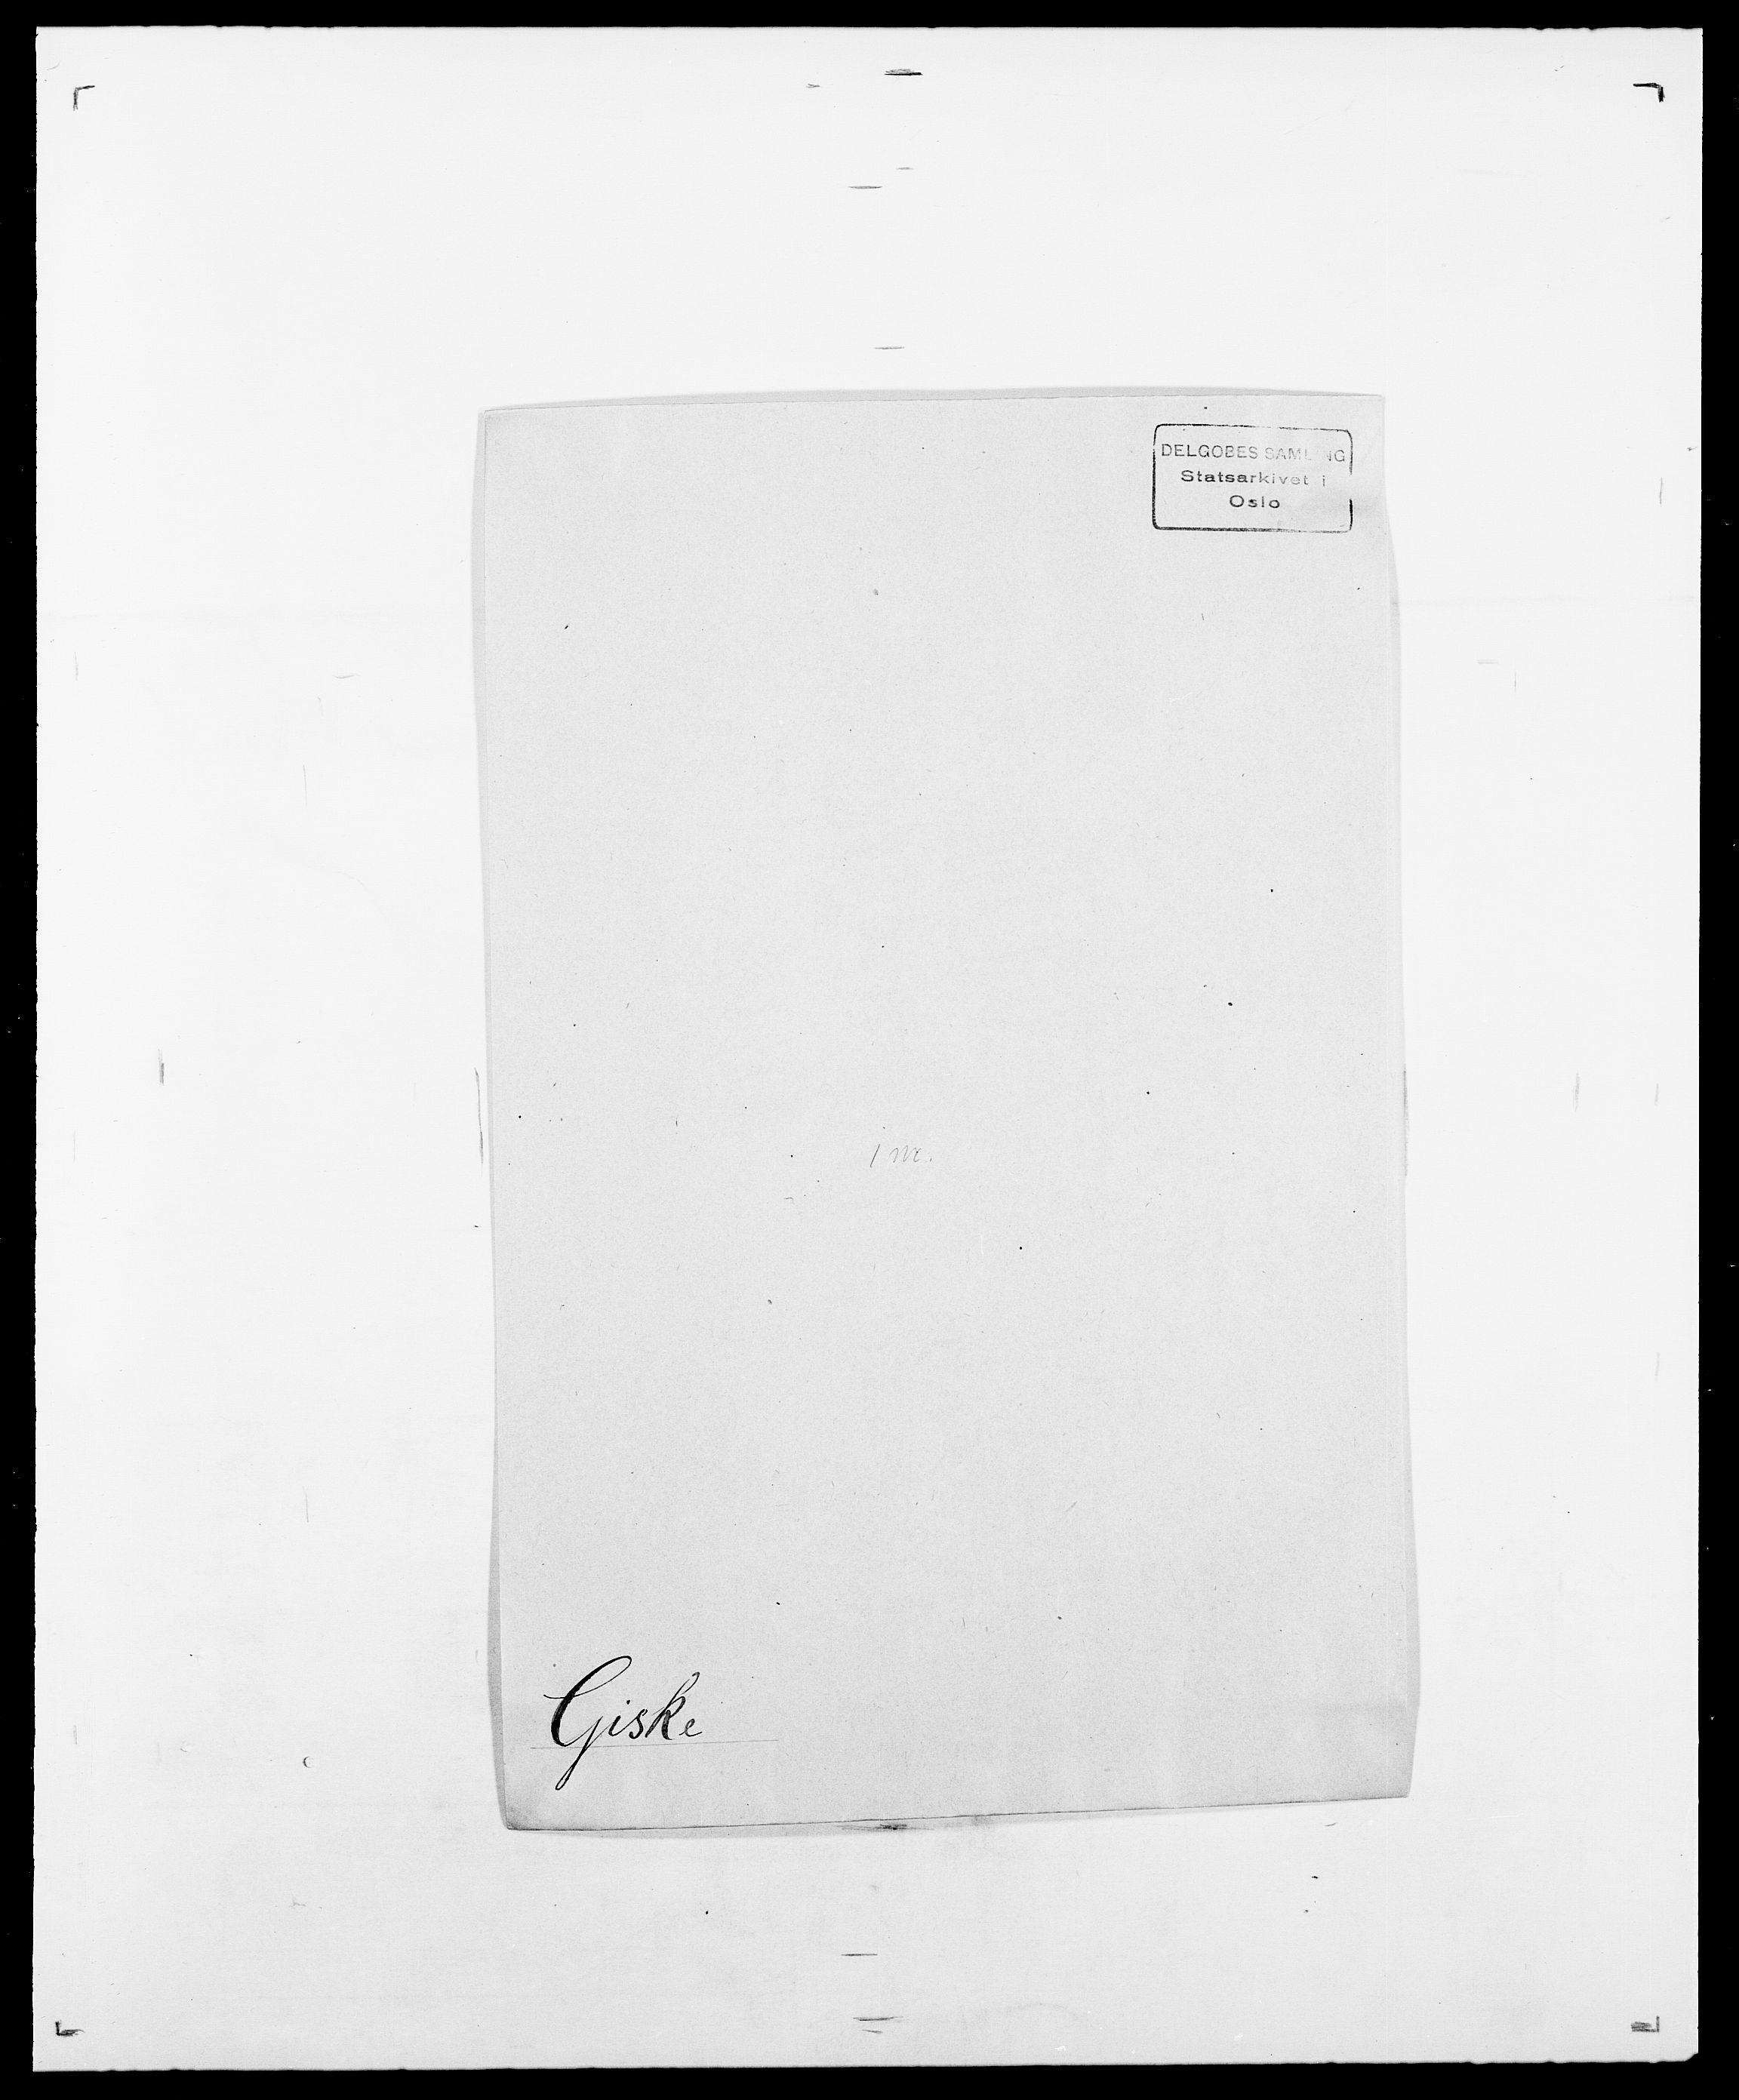 SAO, Delgobe, Charles Antoine - samling, D/Da/L0014: Giebdhausen - Grip, s. 47